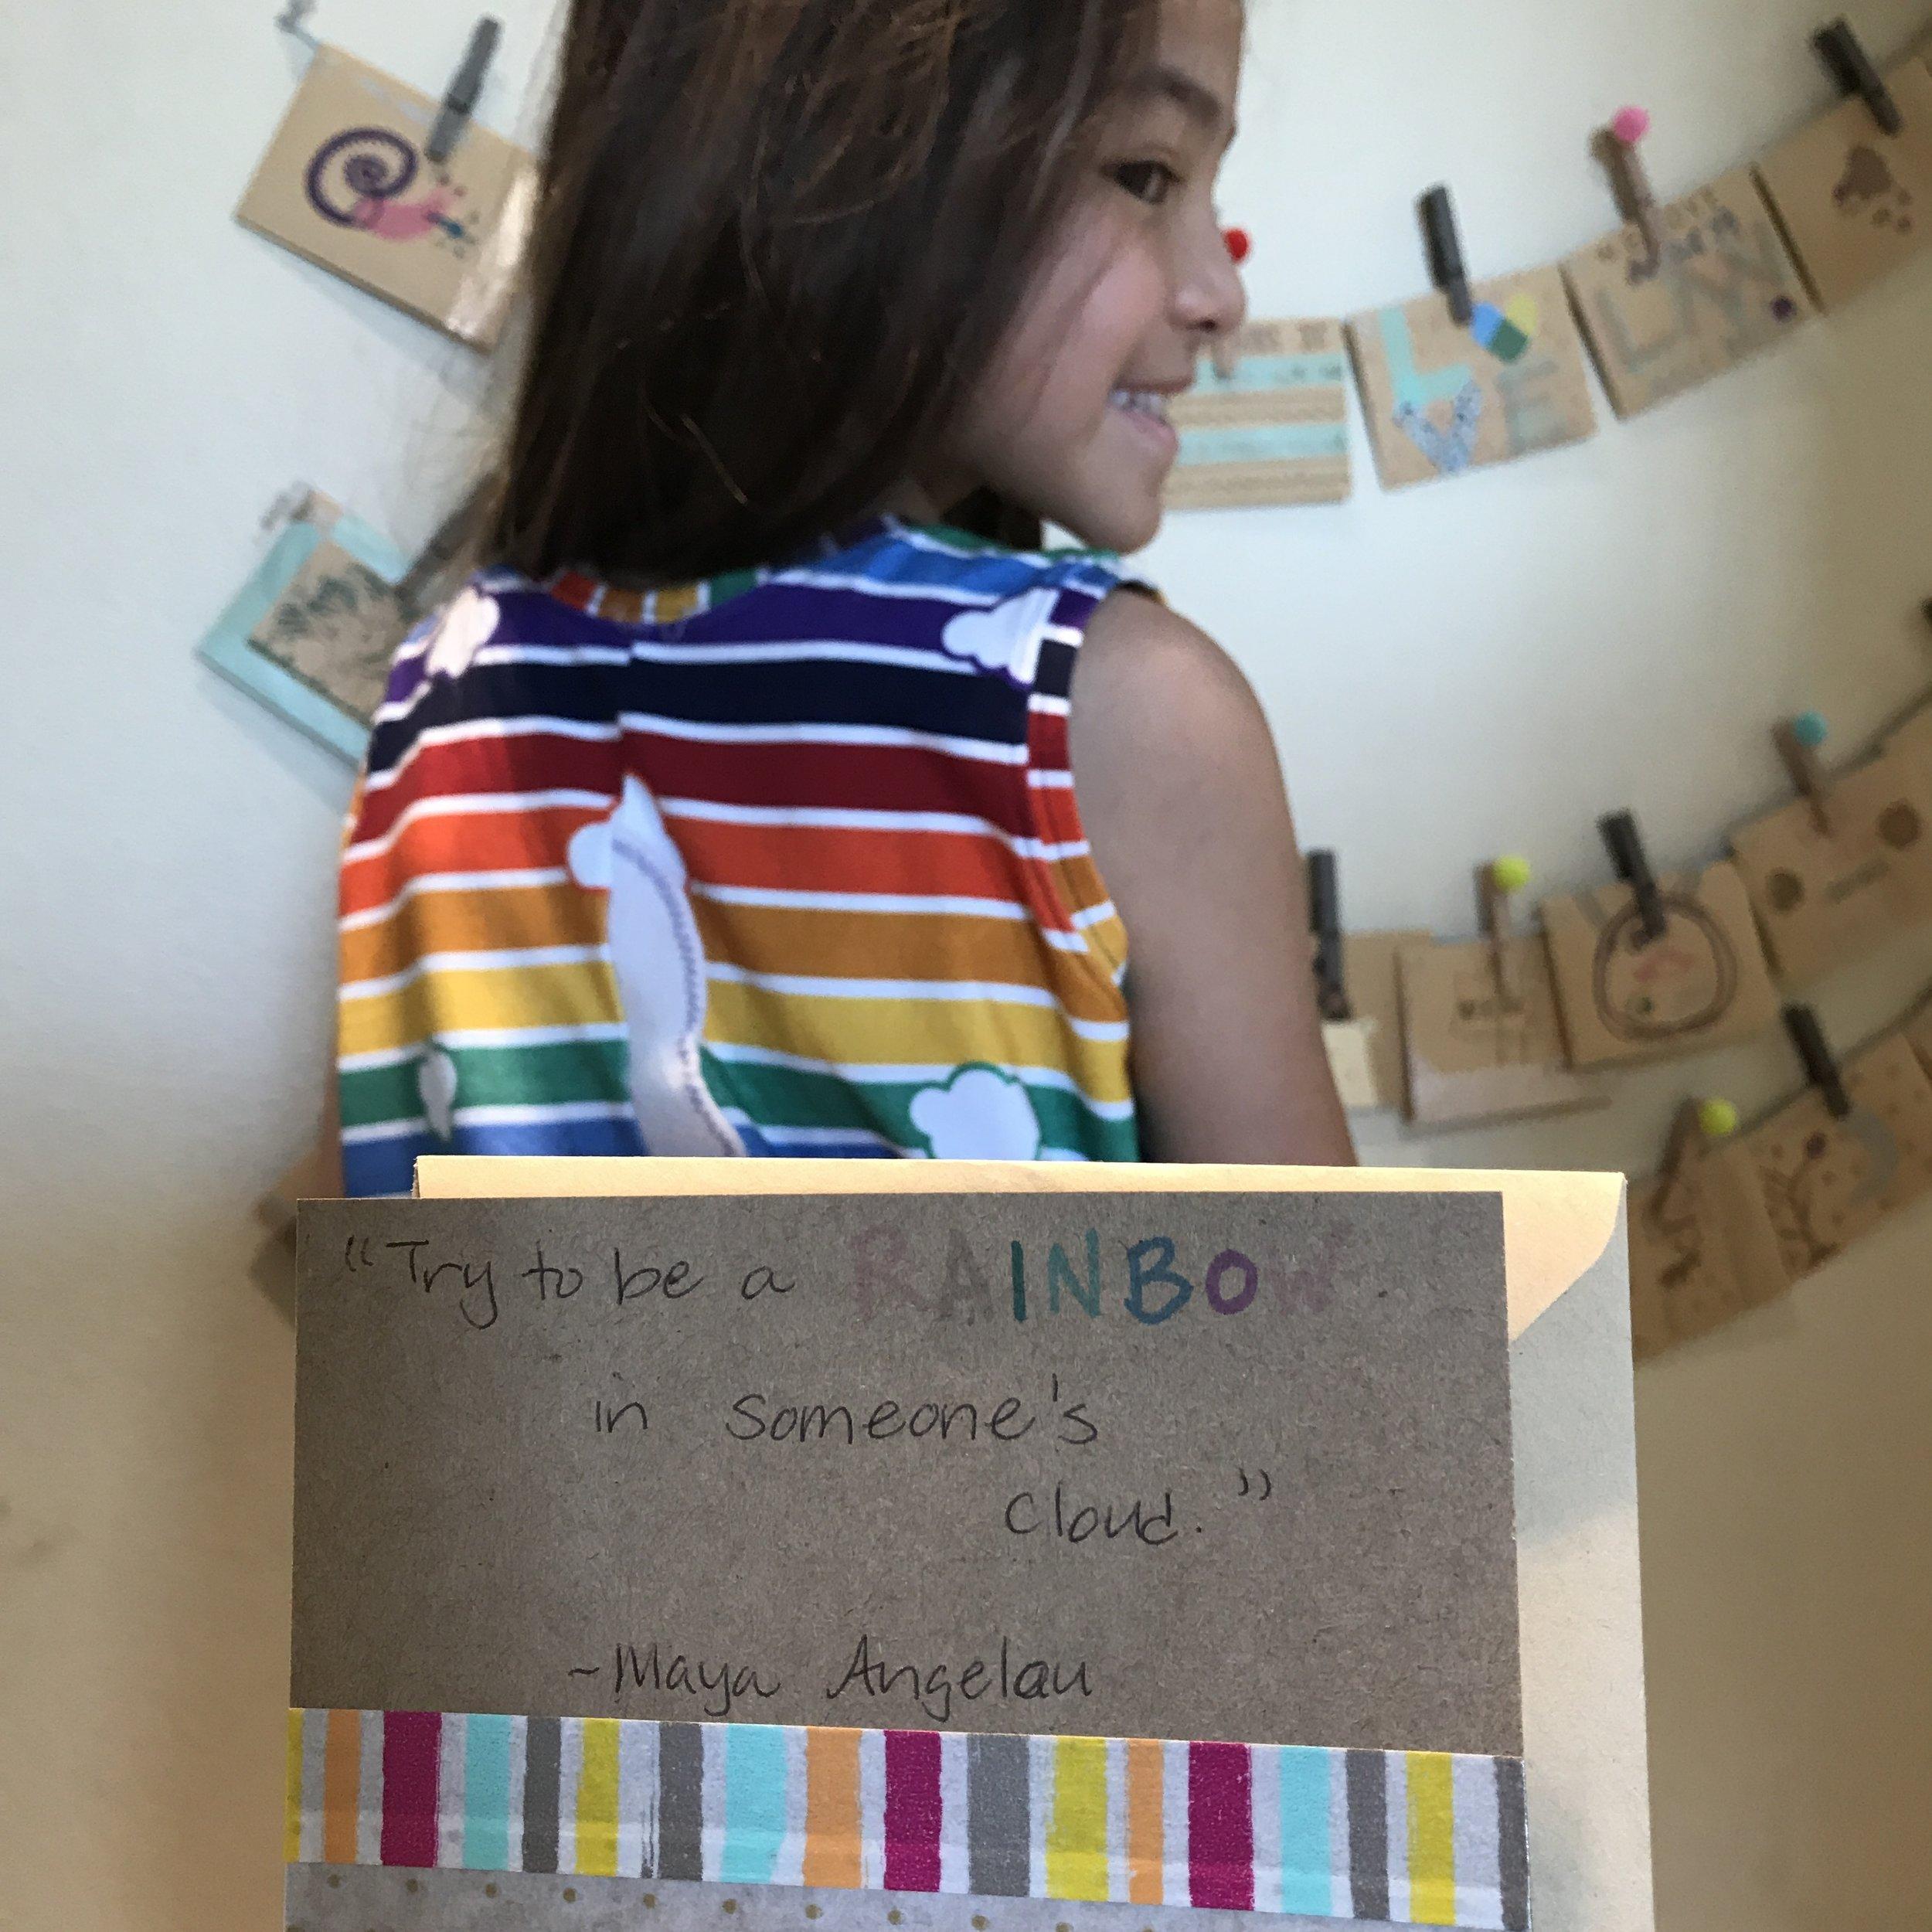 Rainbow Dress Macy's Calendar.JPG